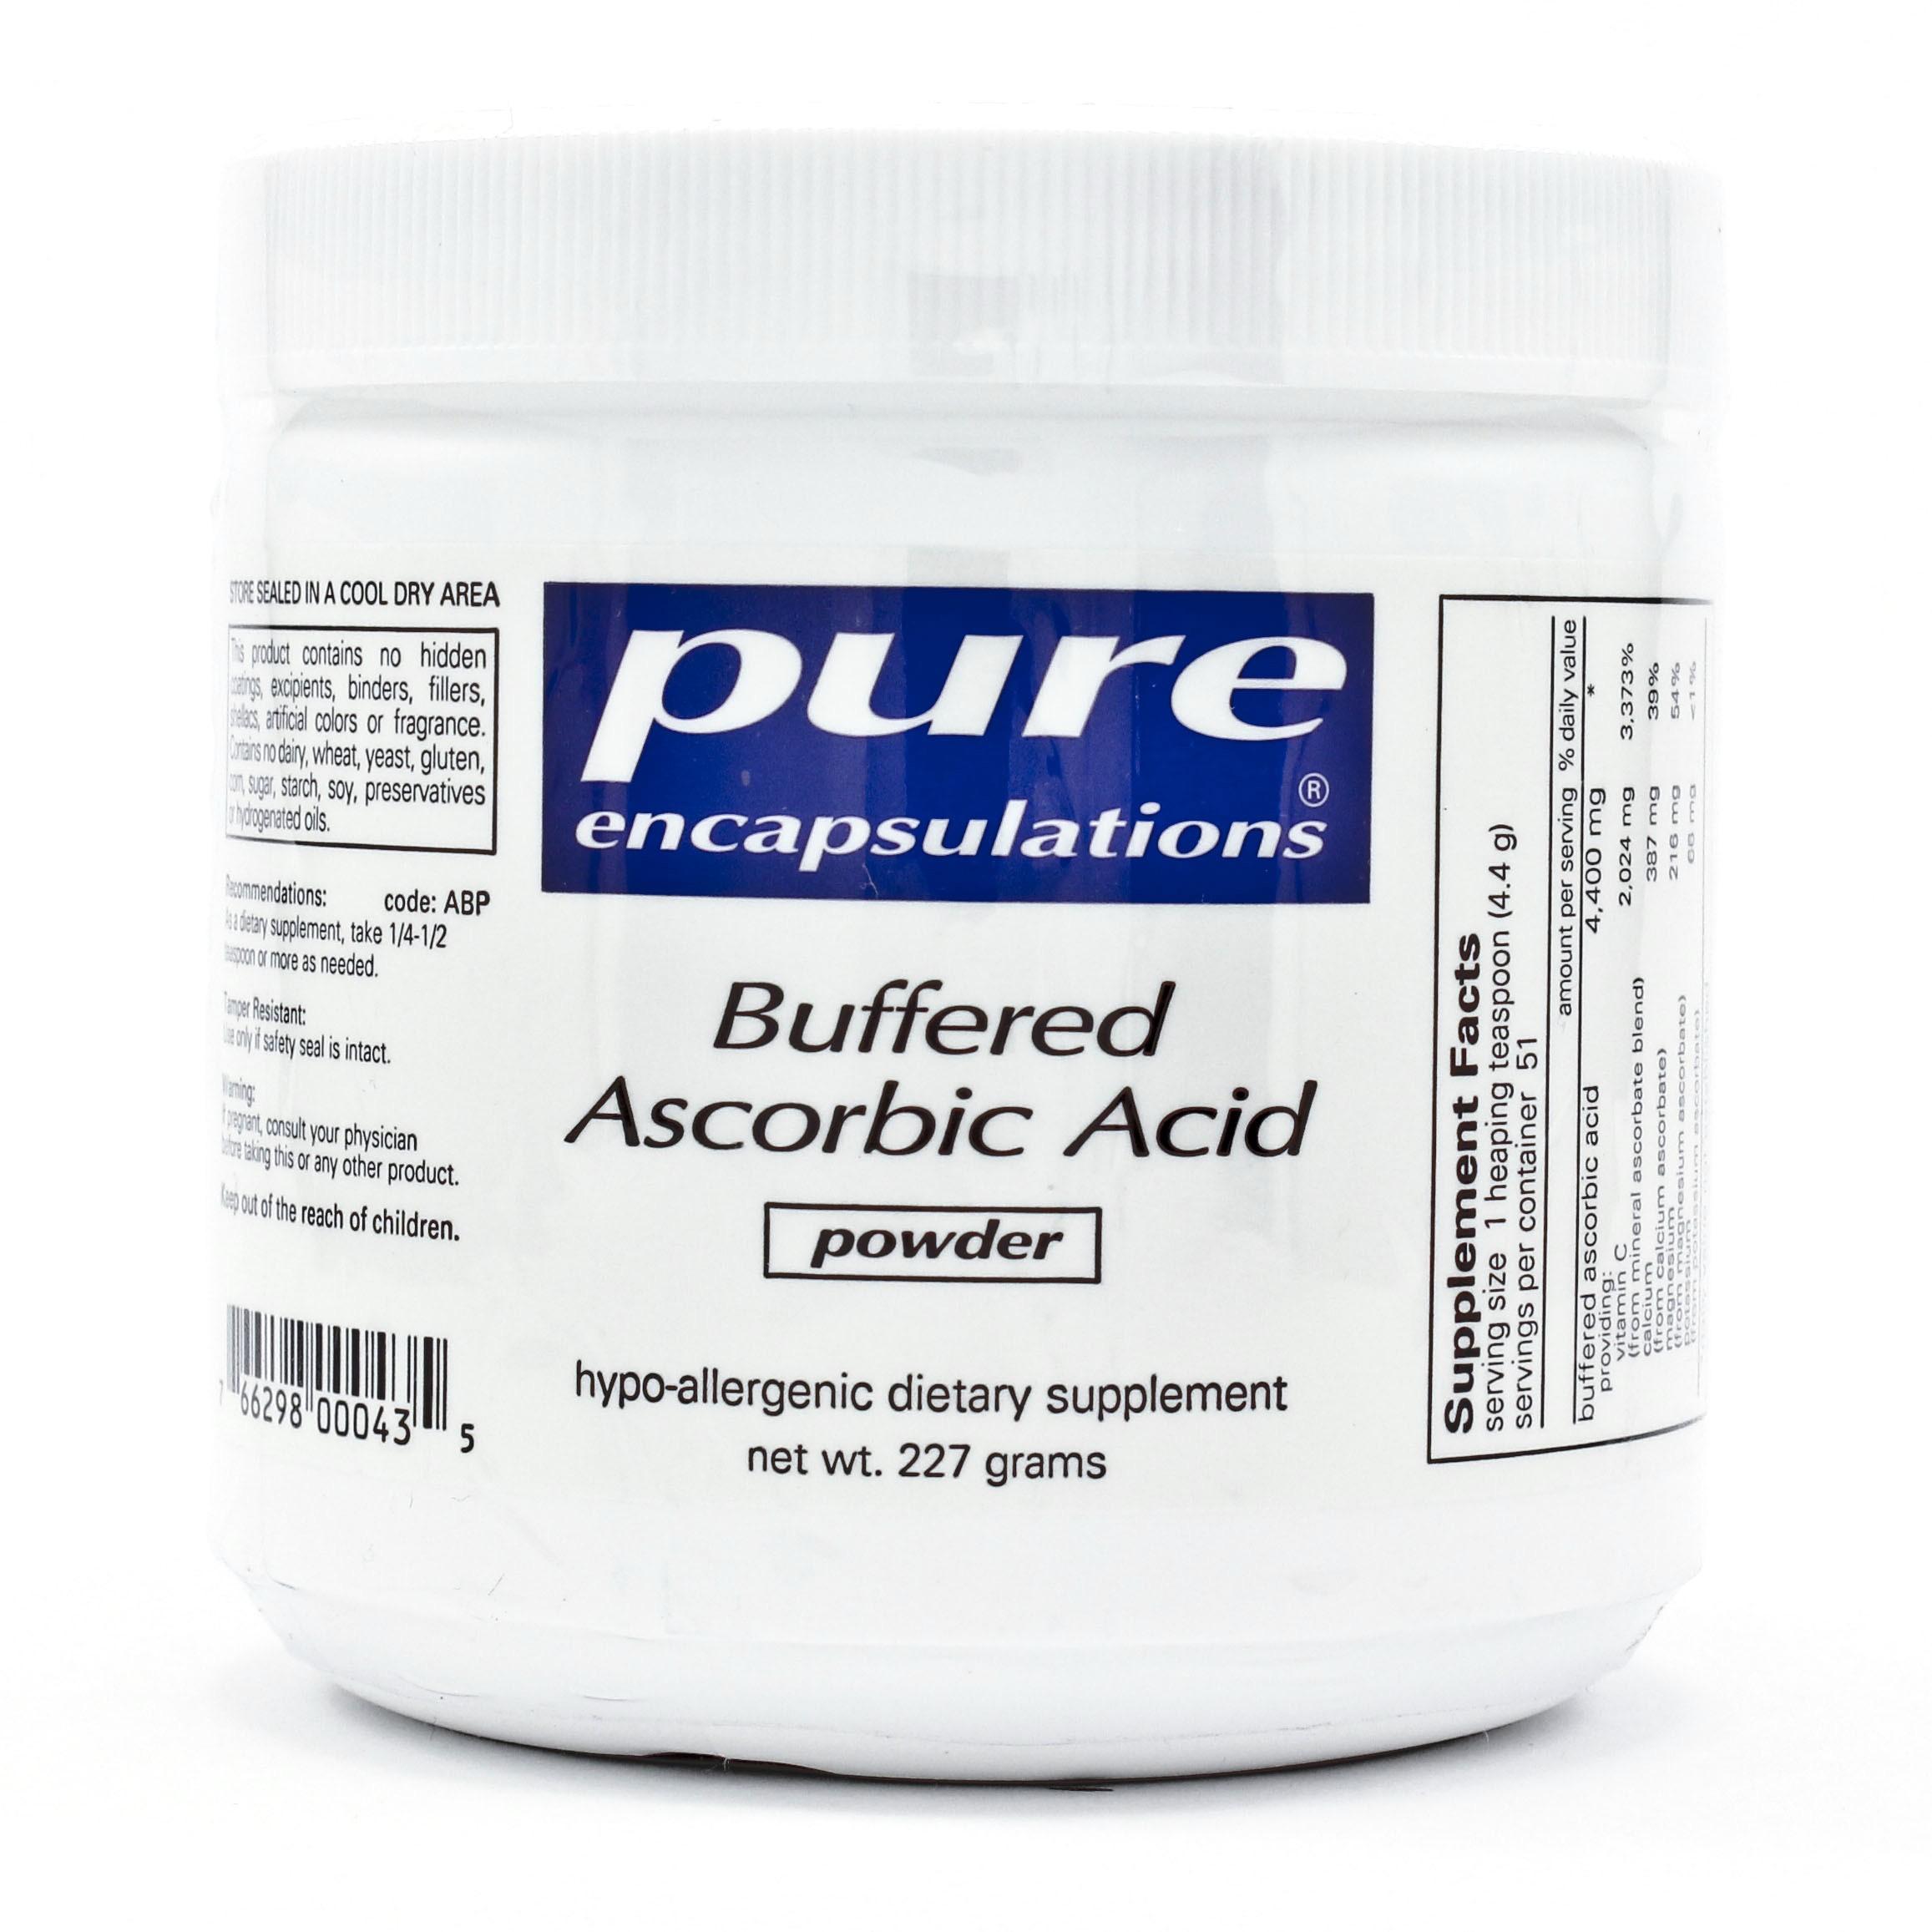 buffered ascorbic acid powder, ascorbic acid, ascorbic acid powder